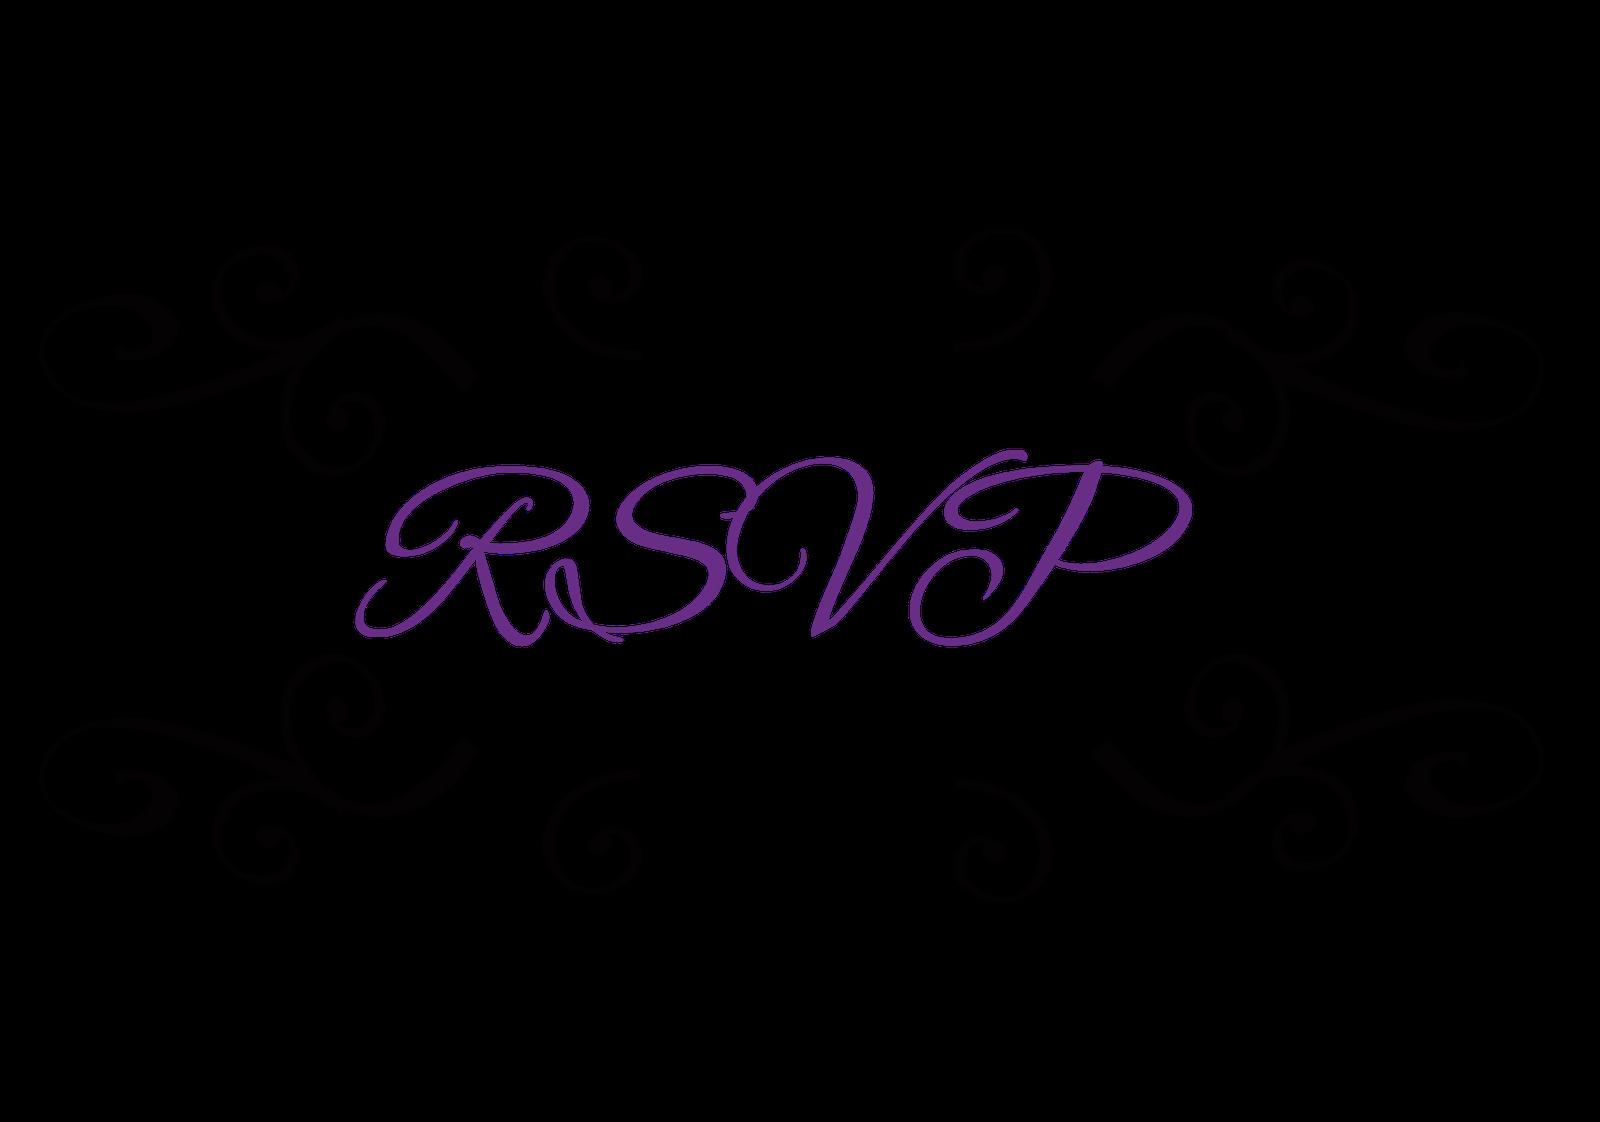 Rsvp clipart free.